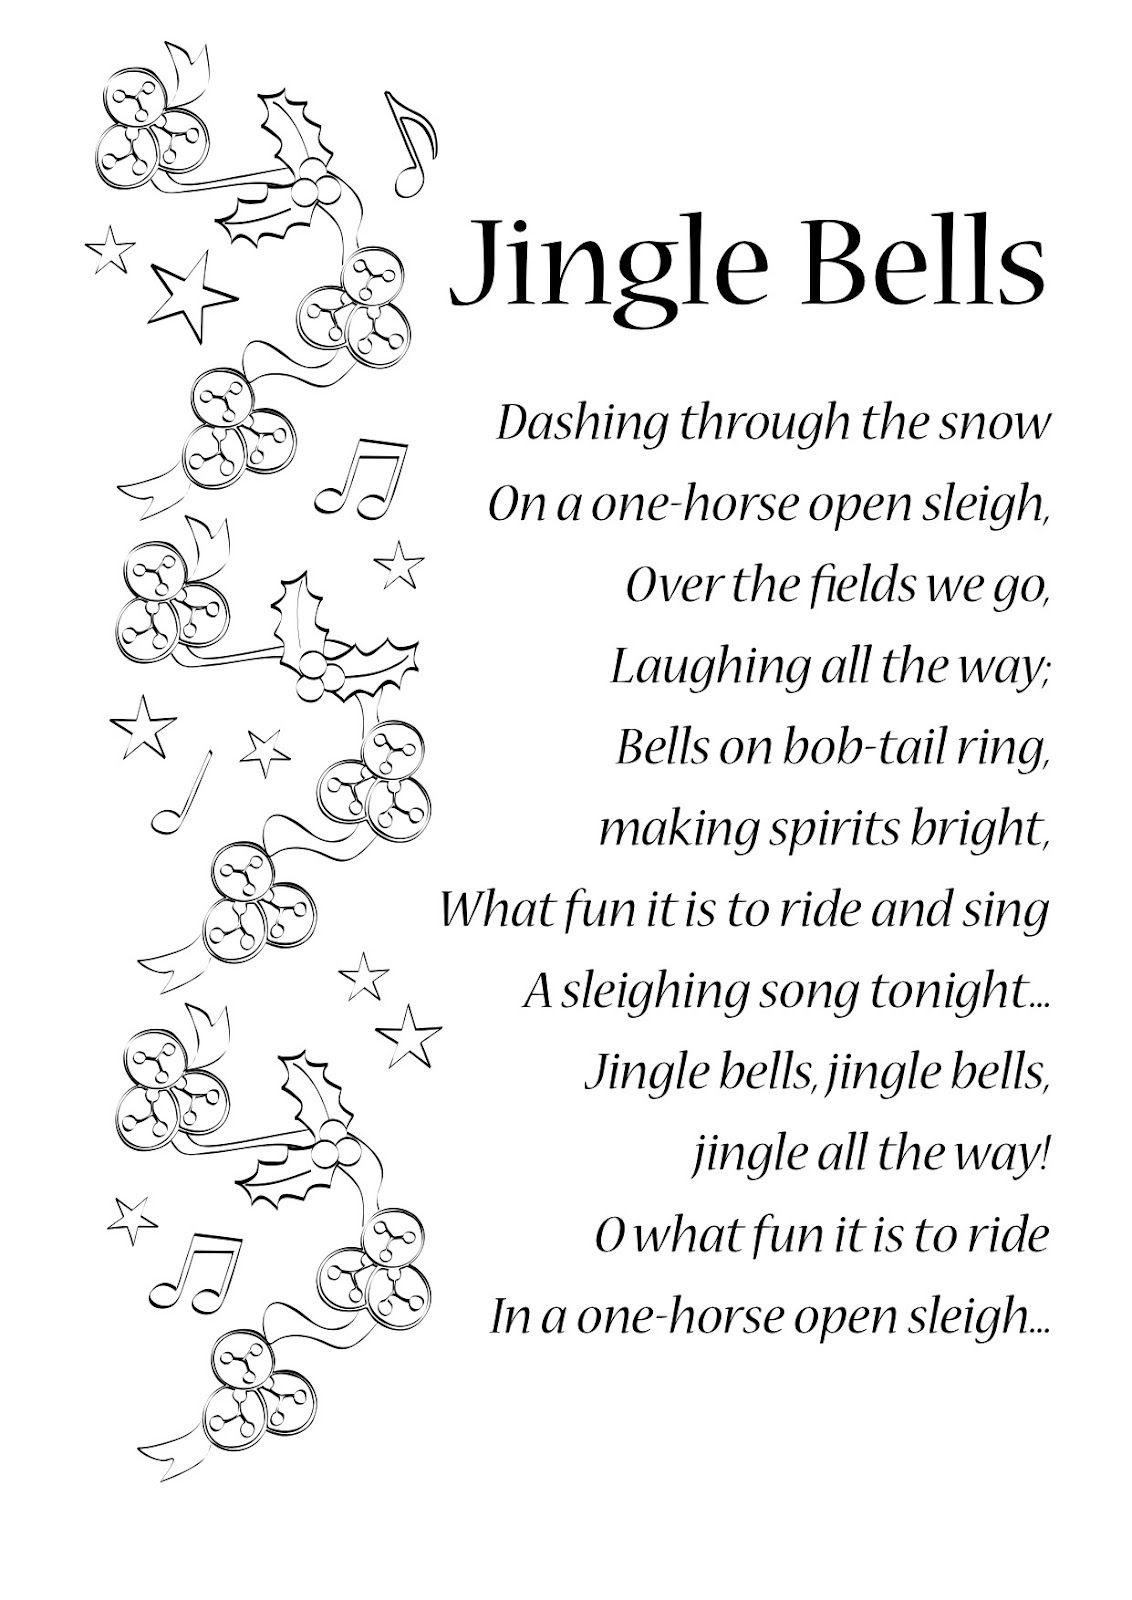 Lyrics To Jingle Bells | English Songs And Rhymes: Lyrics | Songs - Free Printable Lyrics To Christmas Carols